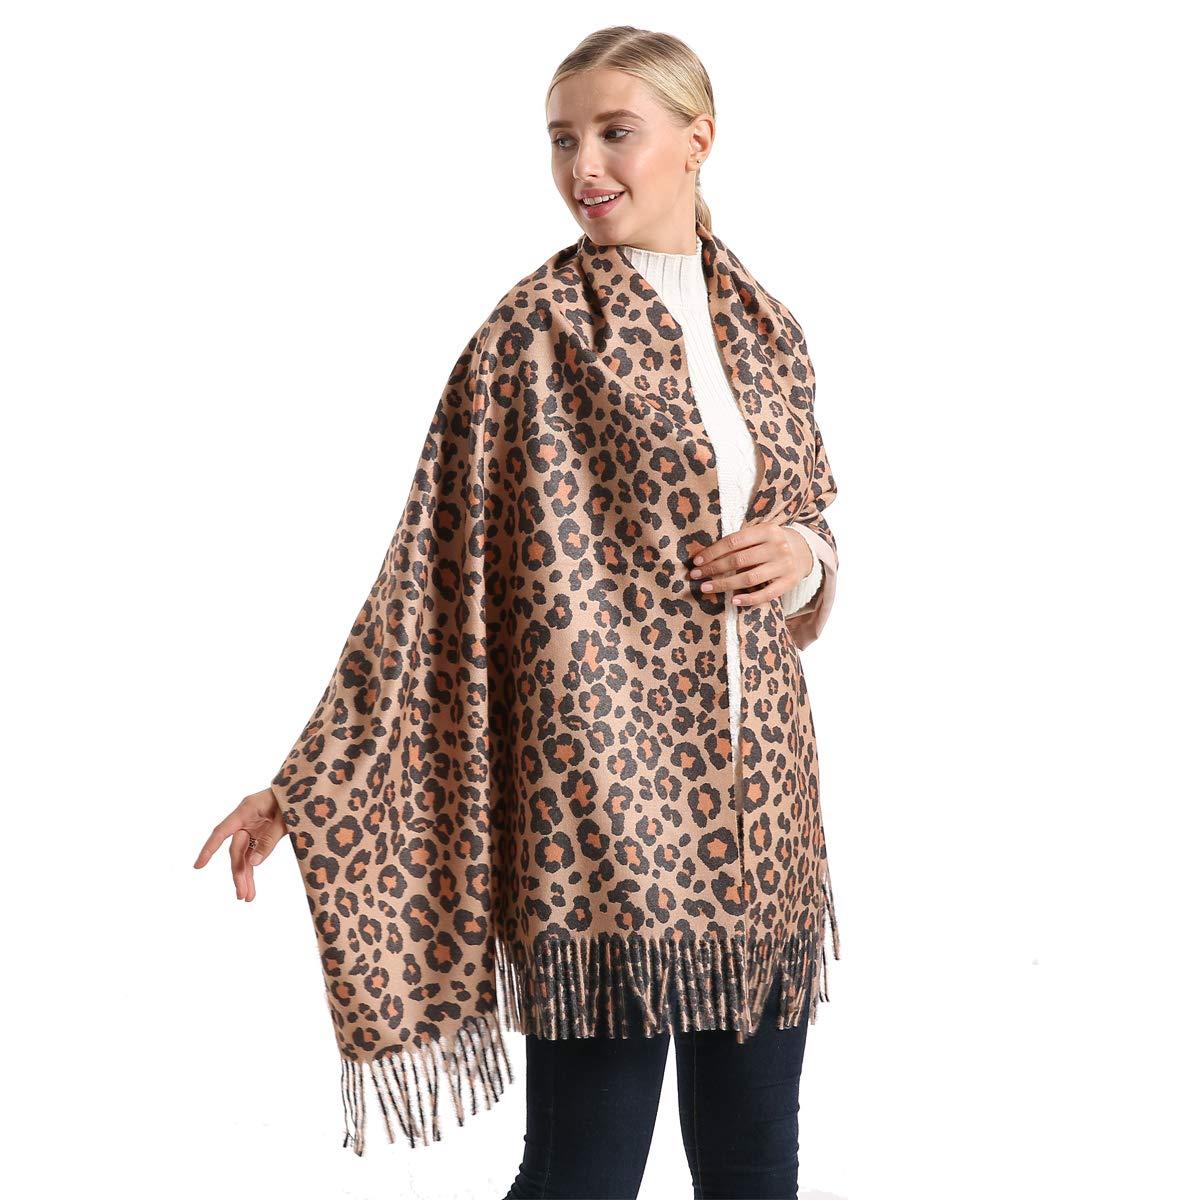 Womens Winter Leopard Scarf With Tassels Animal Print Oversized Premium Fashion Shawl Wrap Scarves